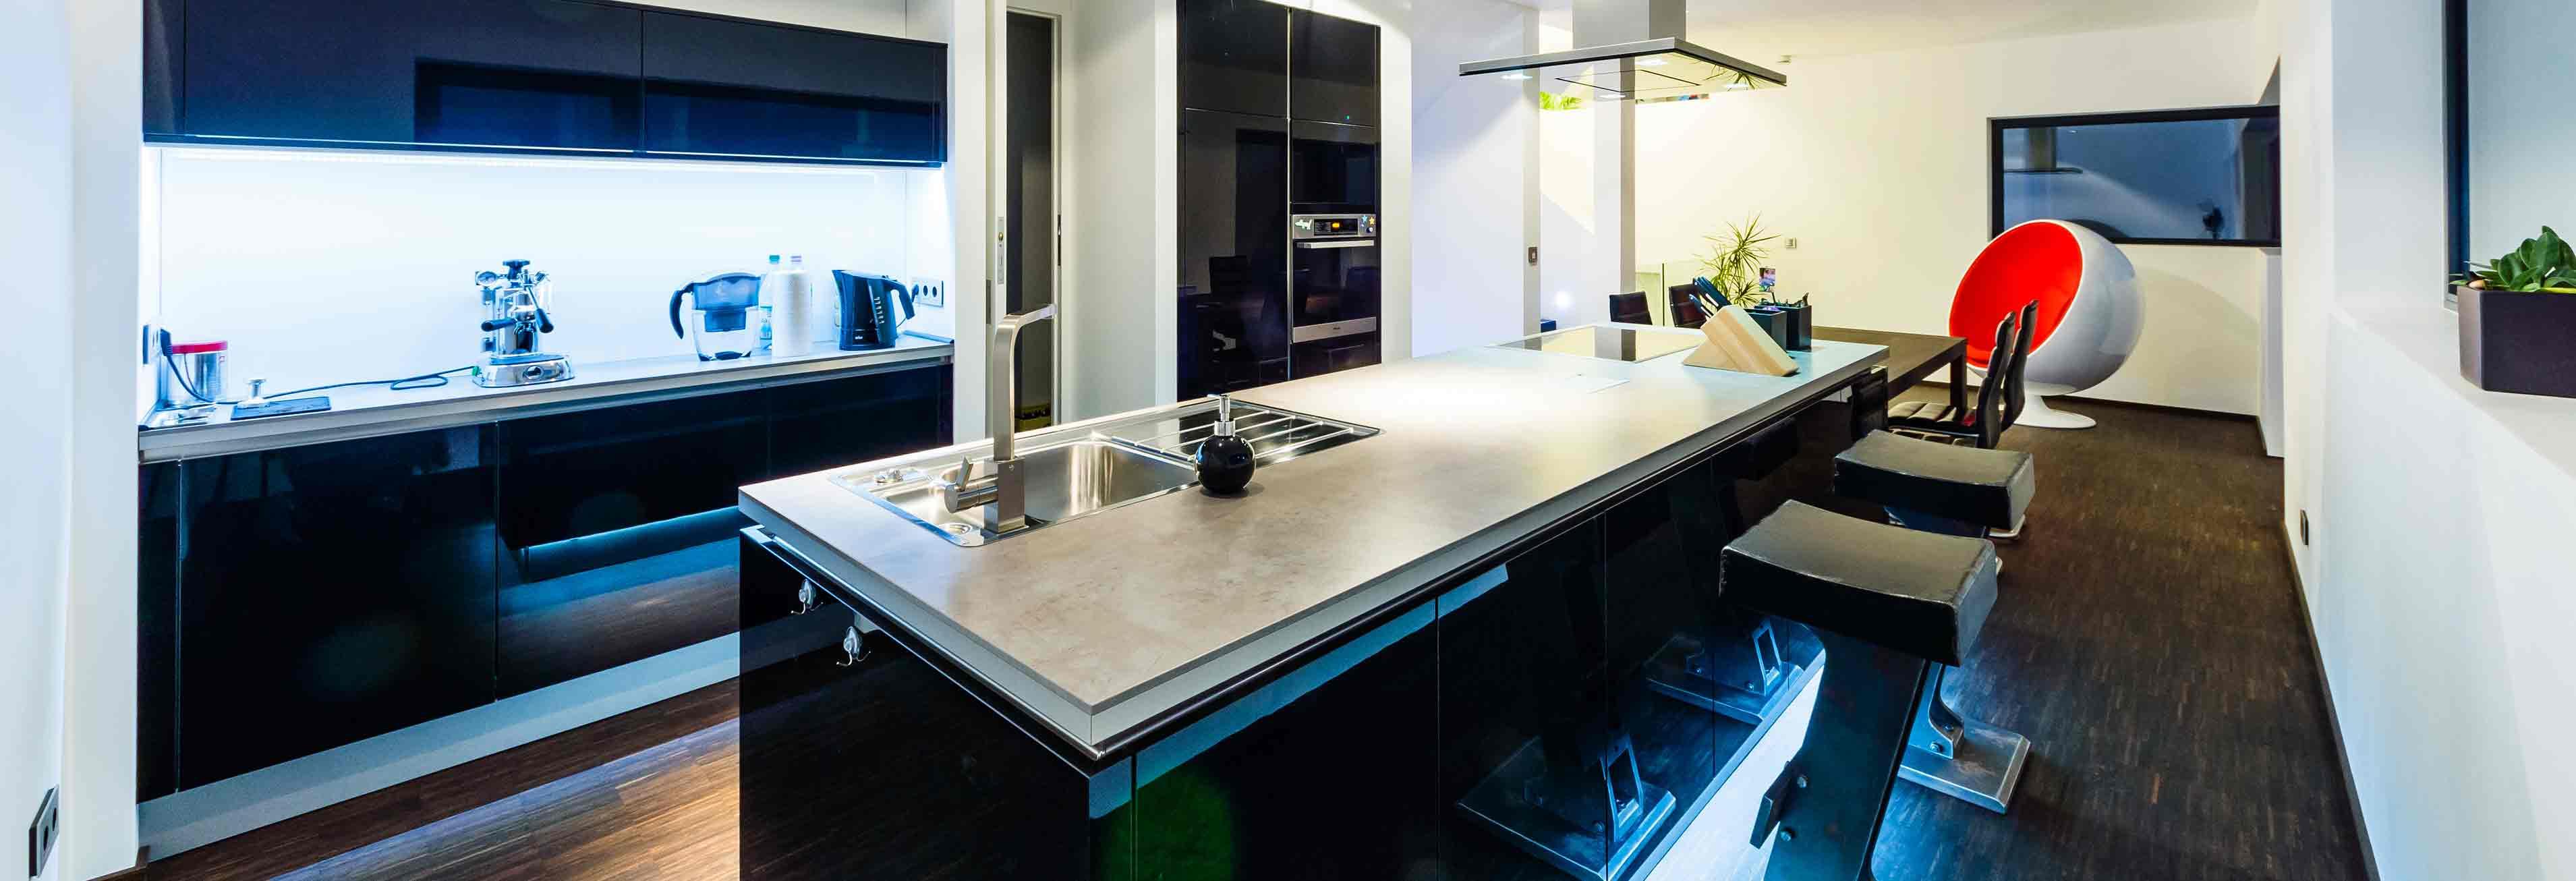 Smart Home Küche